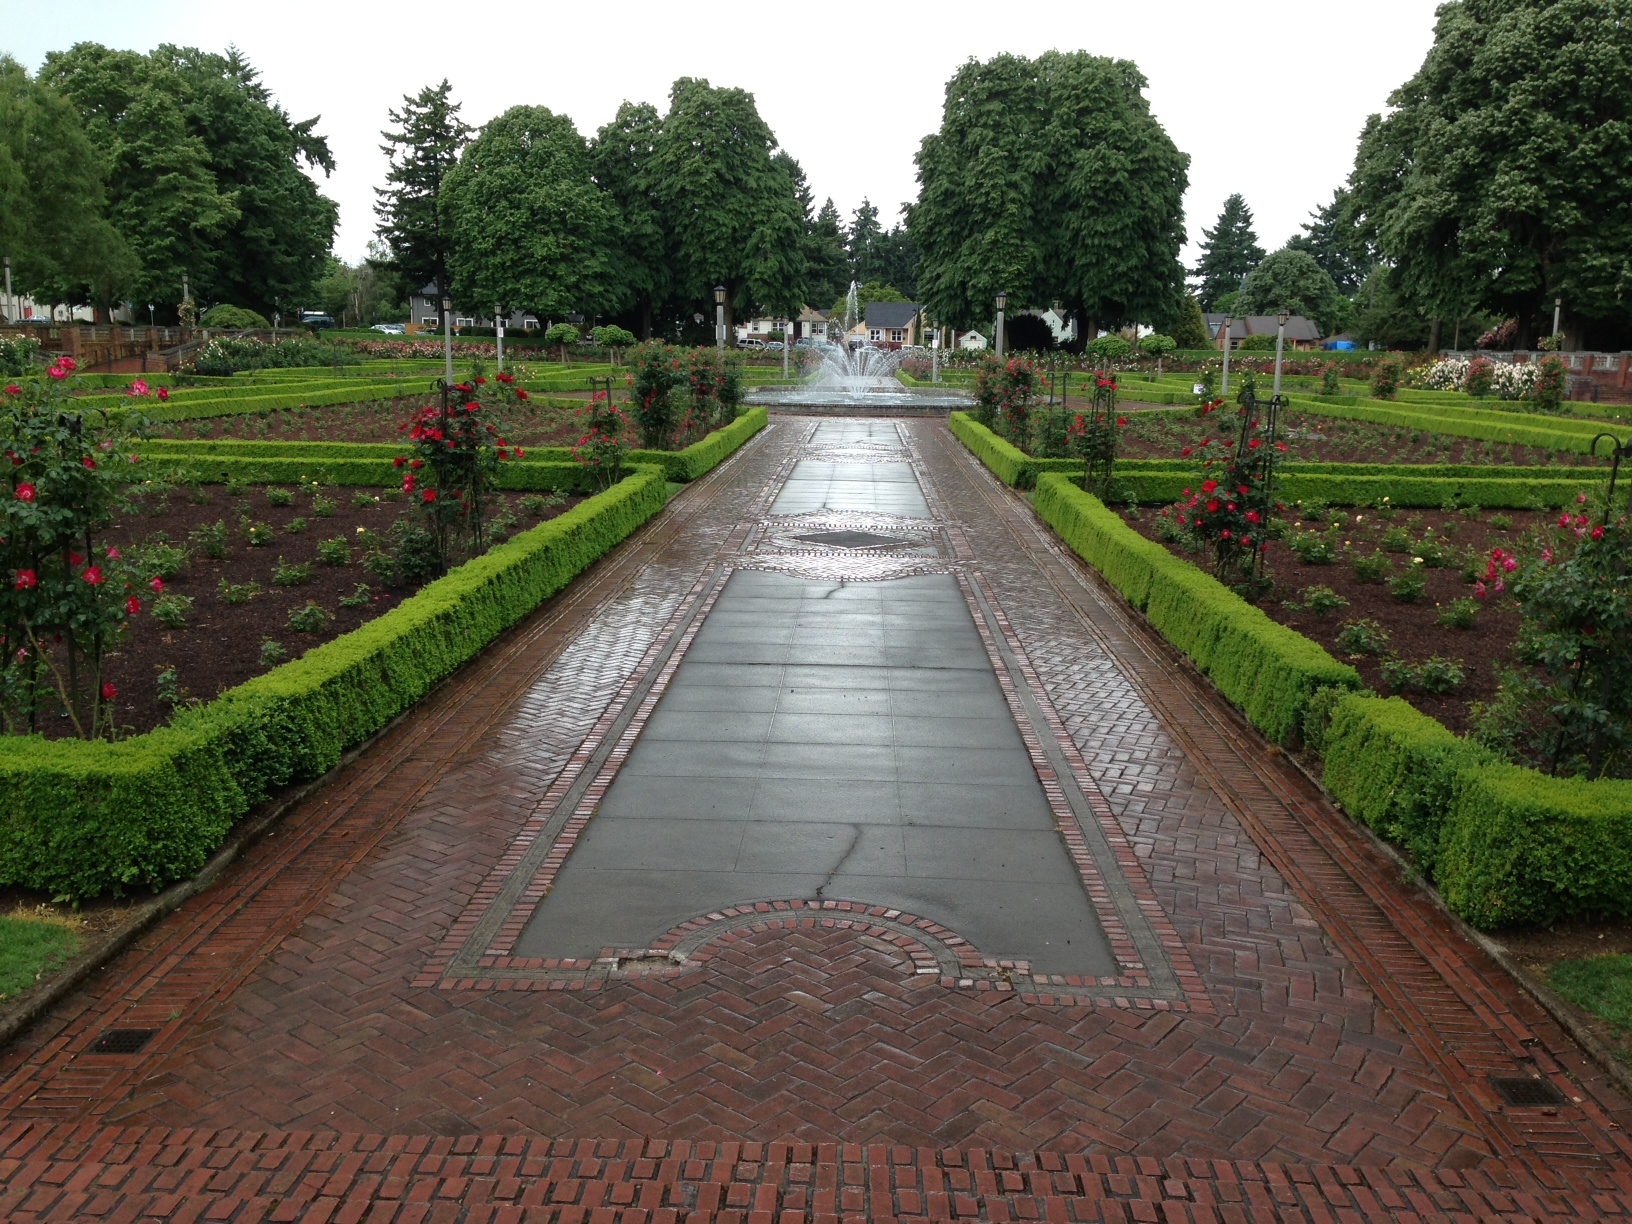 penninsula park